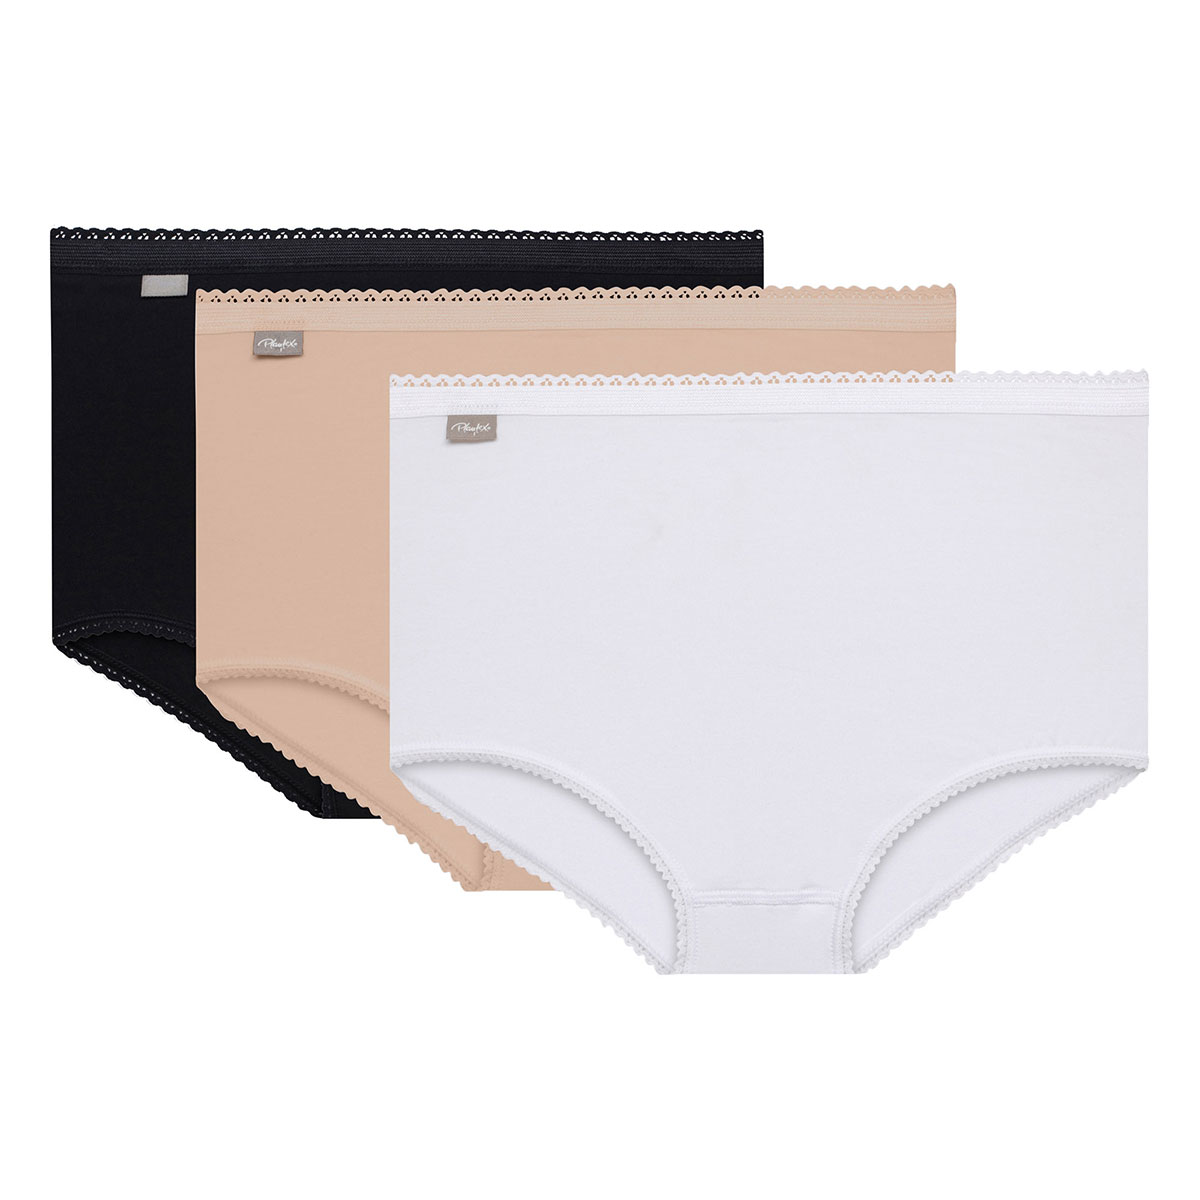 3 bragas maxi negra, blanca y beige - Coton Stretch, , PLAYTEX